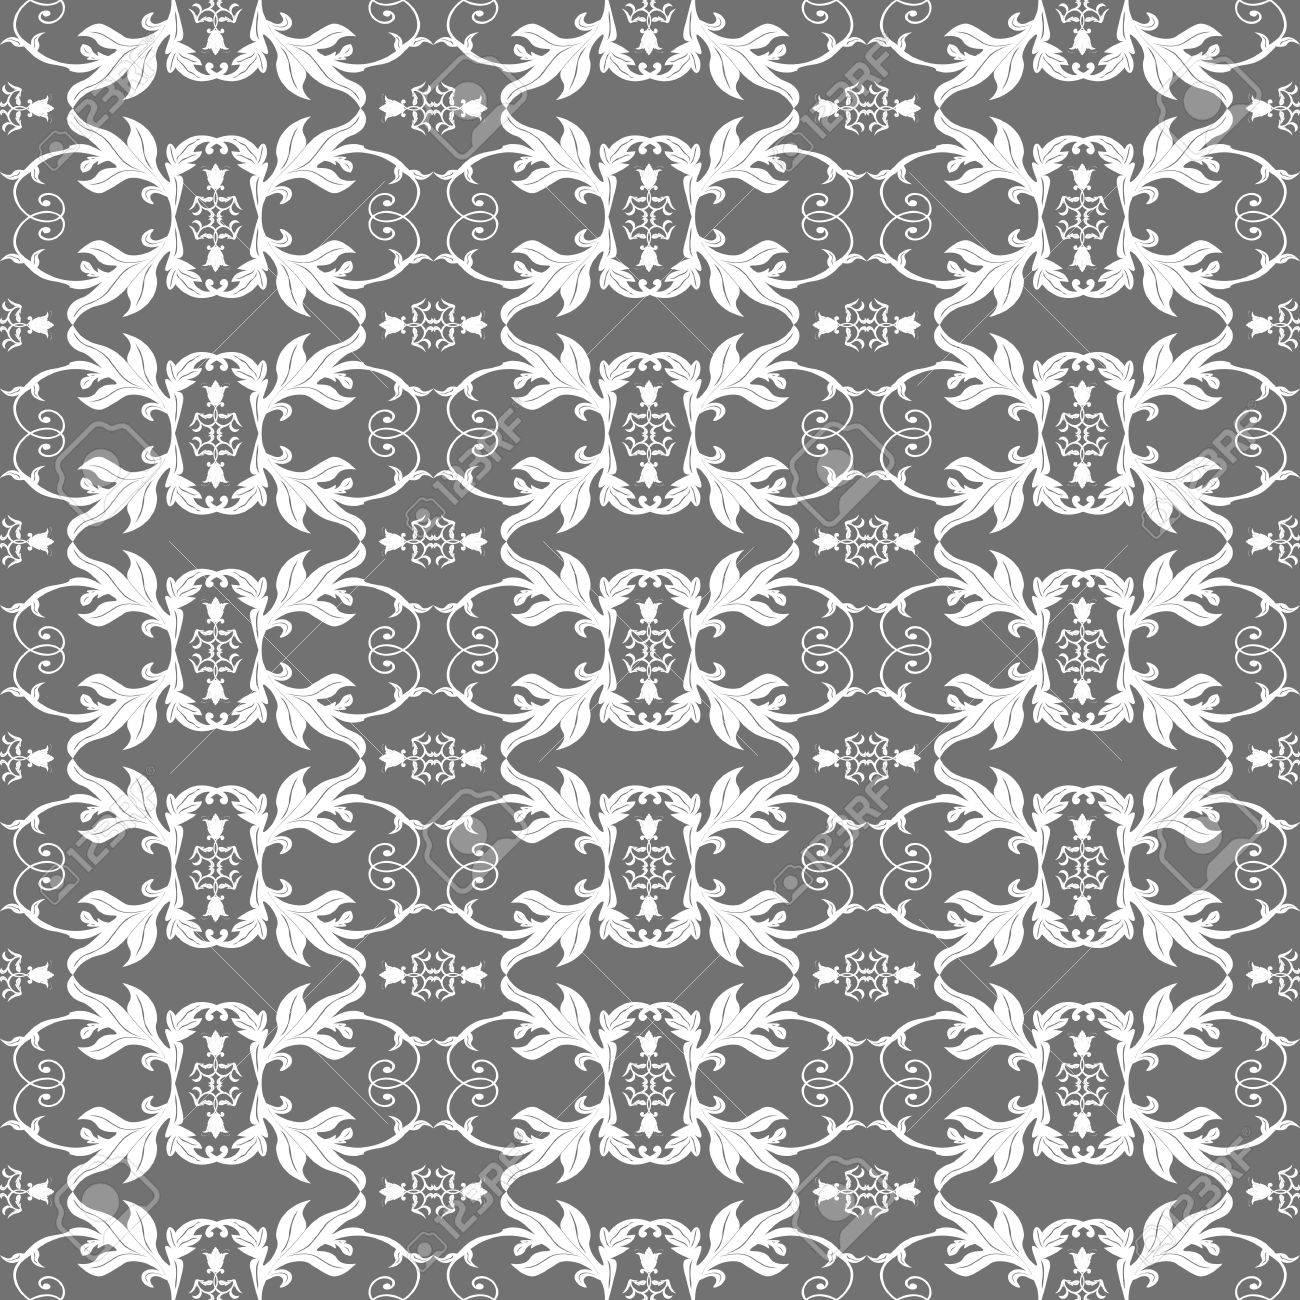 Modern Stylish Geometric Gray And White Floral Flower Pattern